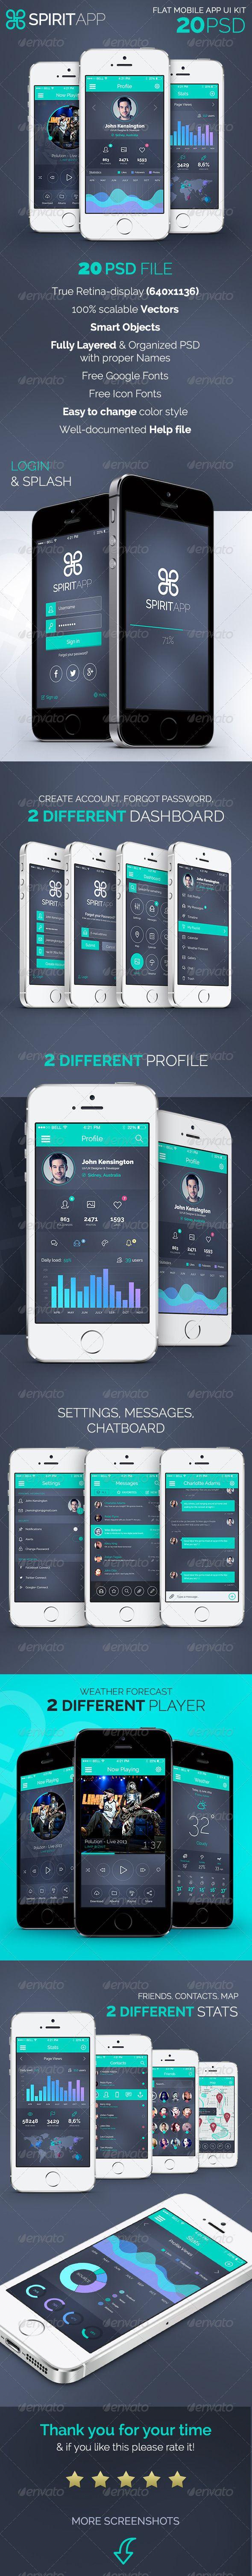 SpiritApp - Flat Mobile Design UI Kit